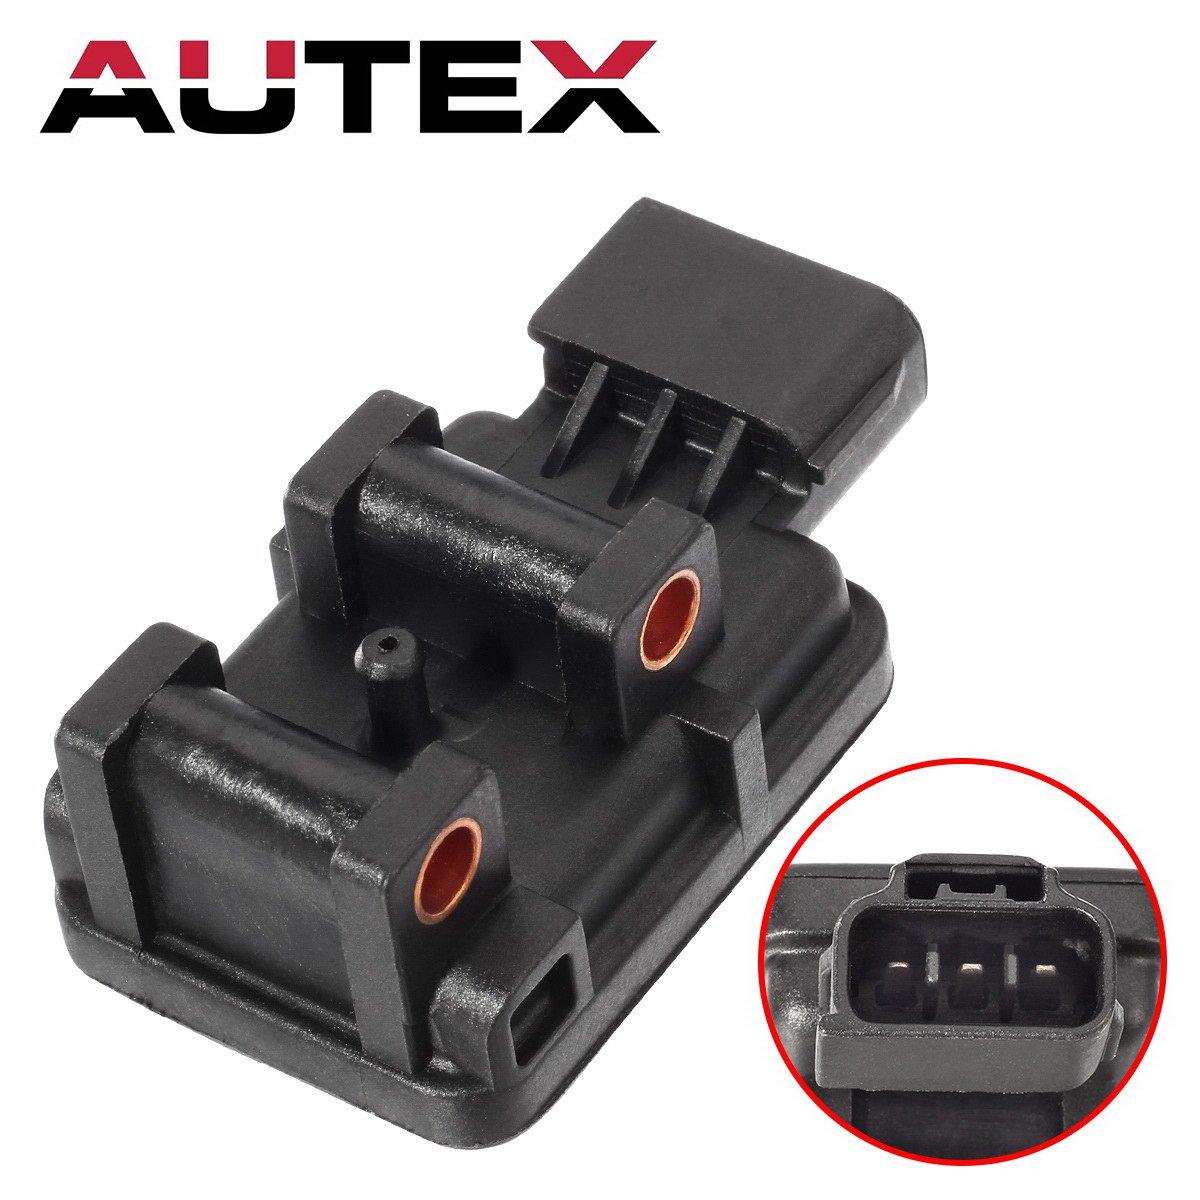 AUTEX MAP Sensor AS88 Manifold Air Pressure Sensor compatible w/Dodge Durango B1500 B2500 B3500 Dakota Ram 1500 1500 Van Ram 2500 2500 Van Ram 3500 Van Viper Jeep Cherokee Grand Cherokee Wrangler